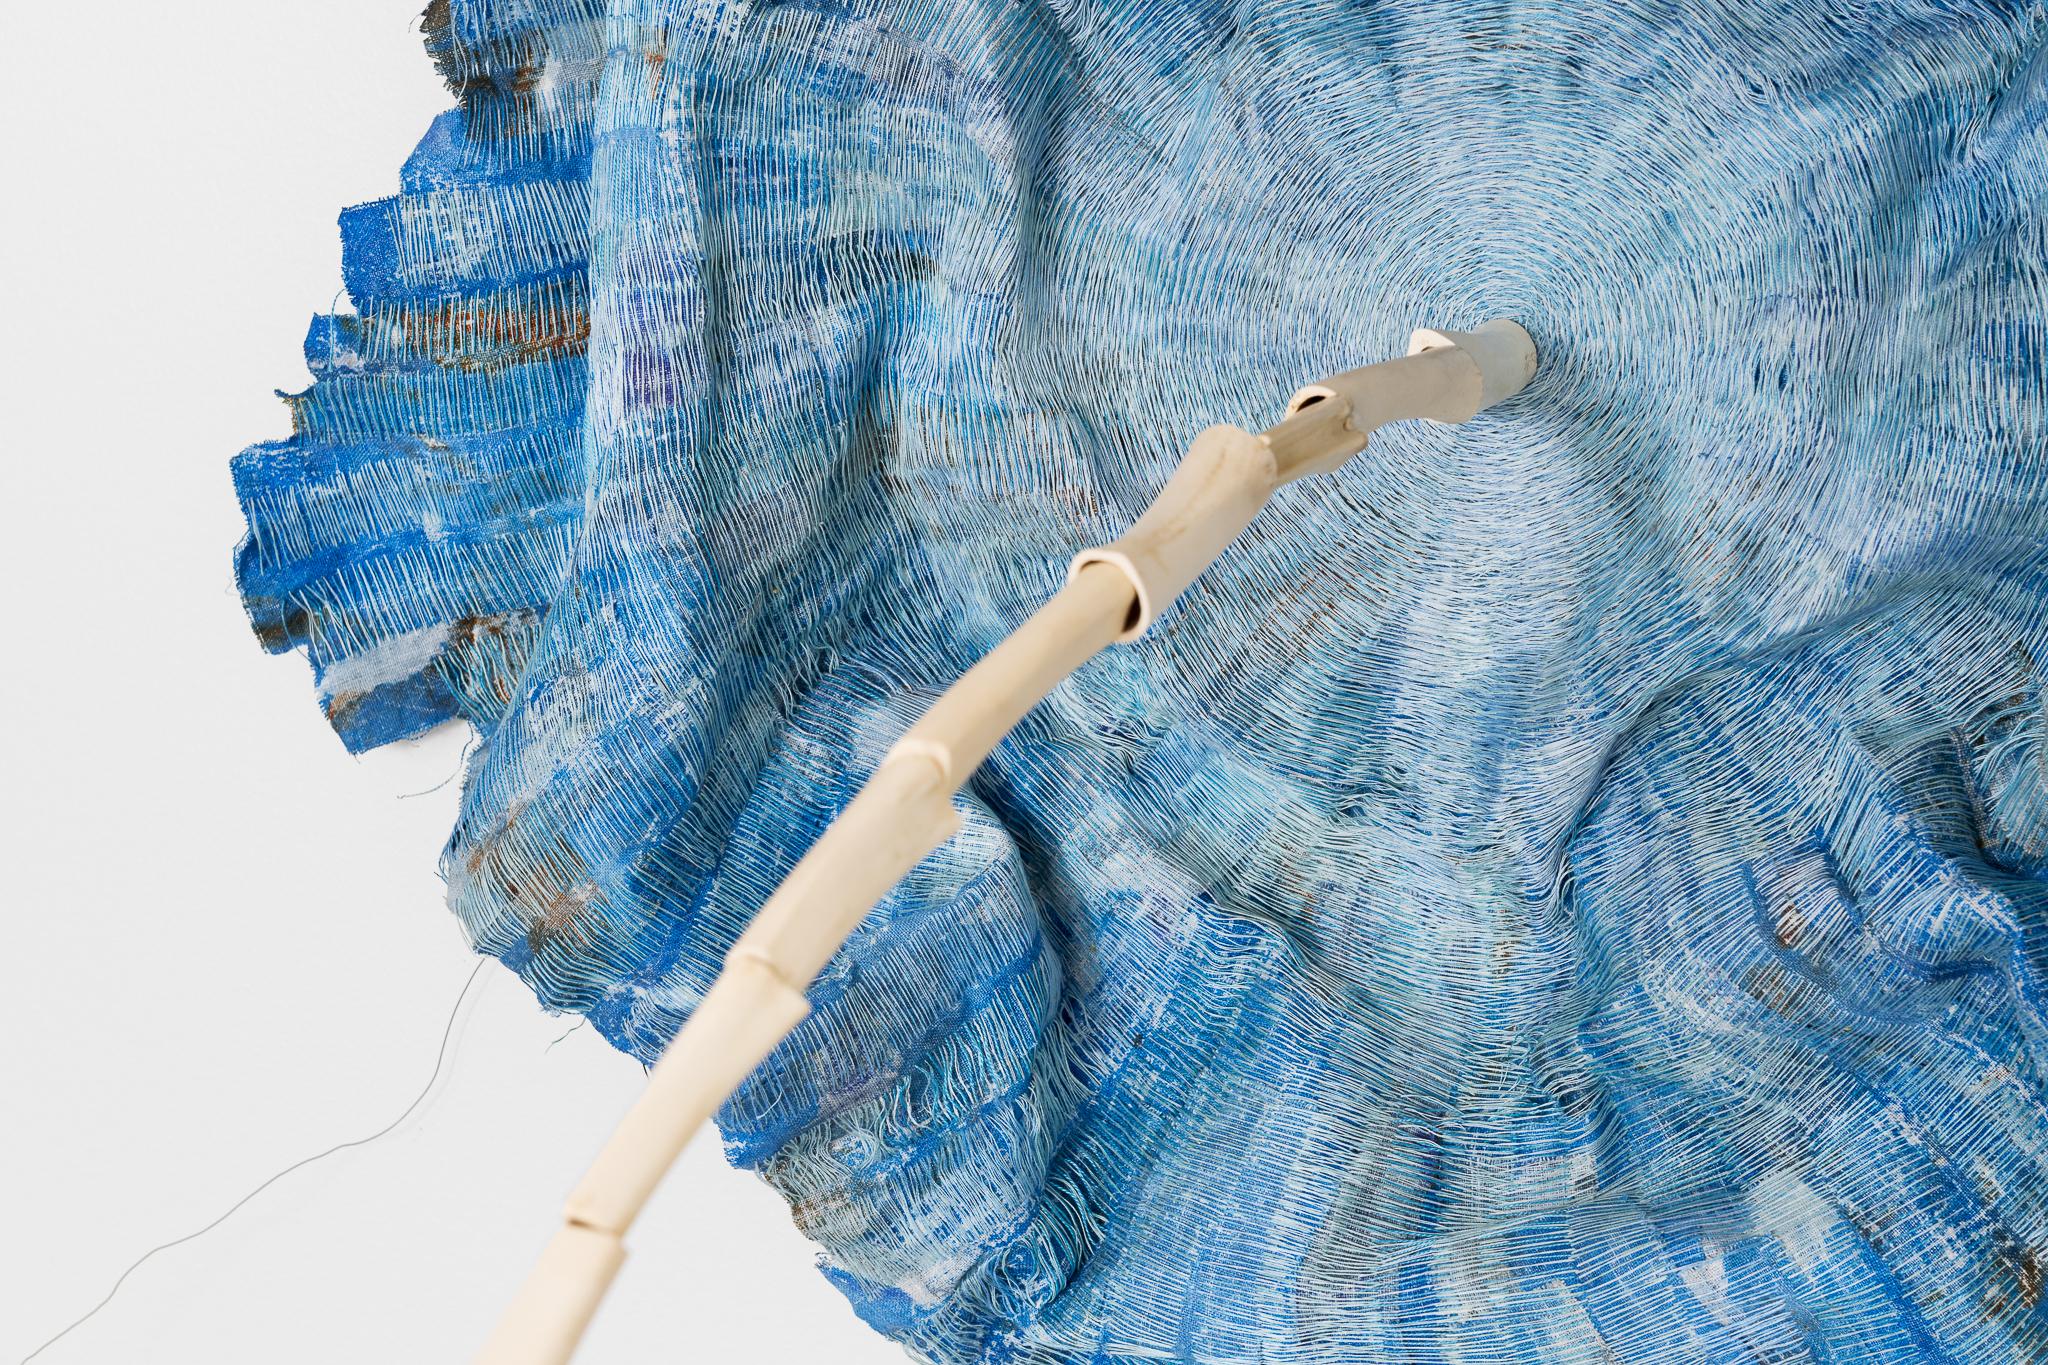 Aslaug M. Juliussen,  Multiple Stiches – sight in absence , 2016. (Detalj) Vegg/gulvobjekt i tekstilm broderi, beinpiper og hestetagl. Foto: Istvan Virag